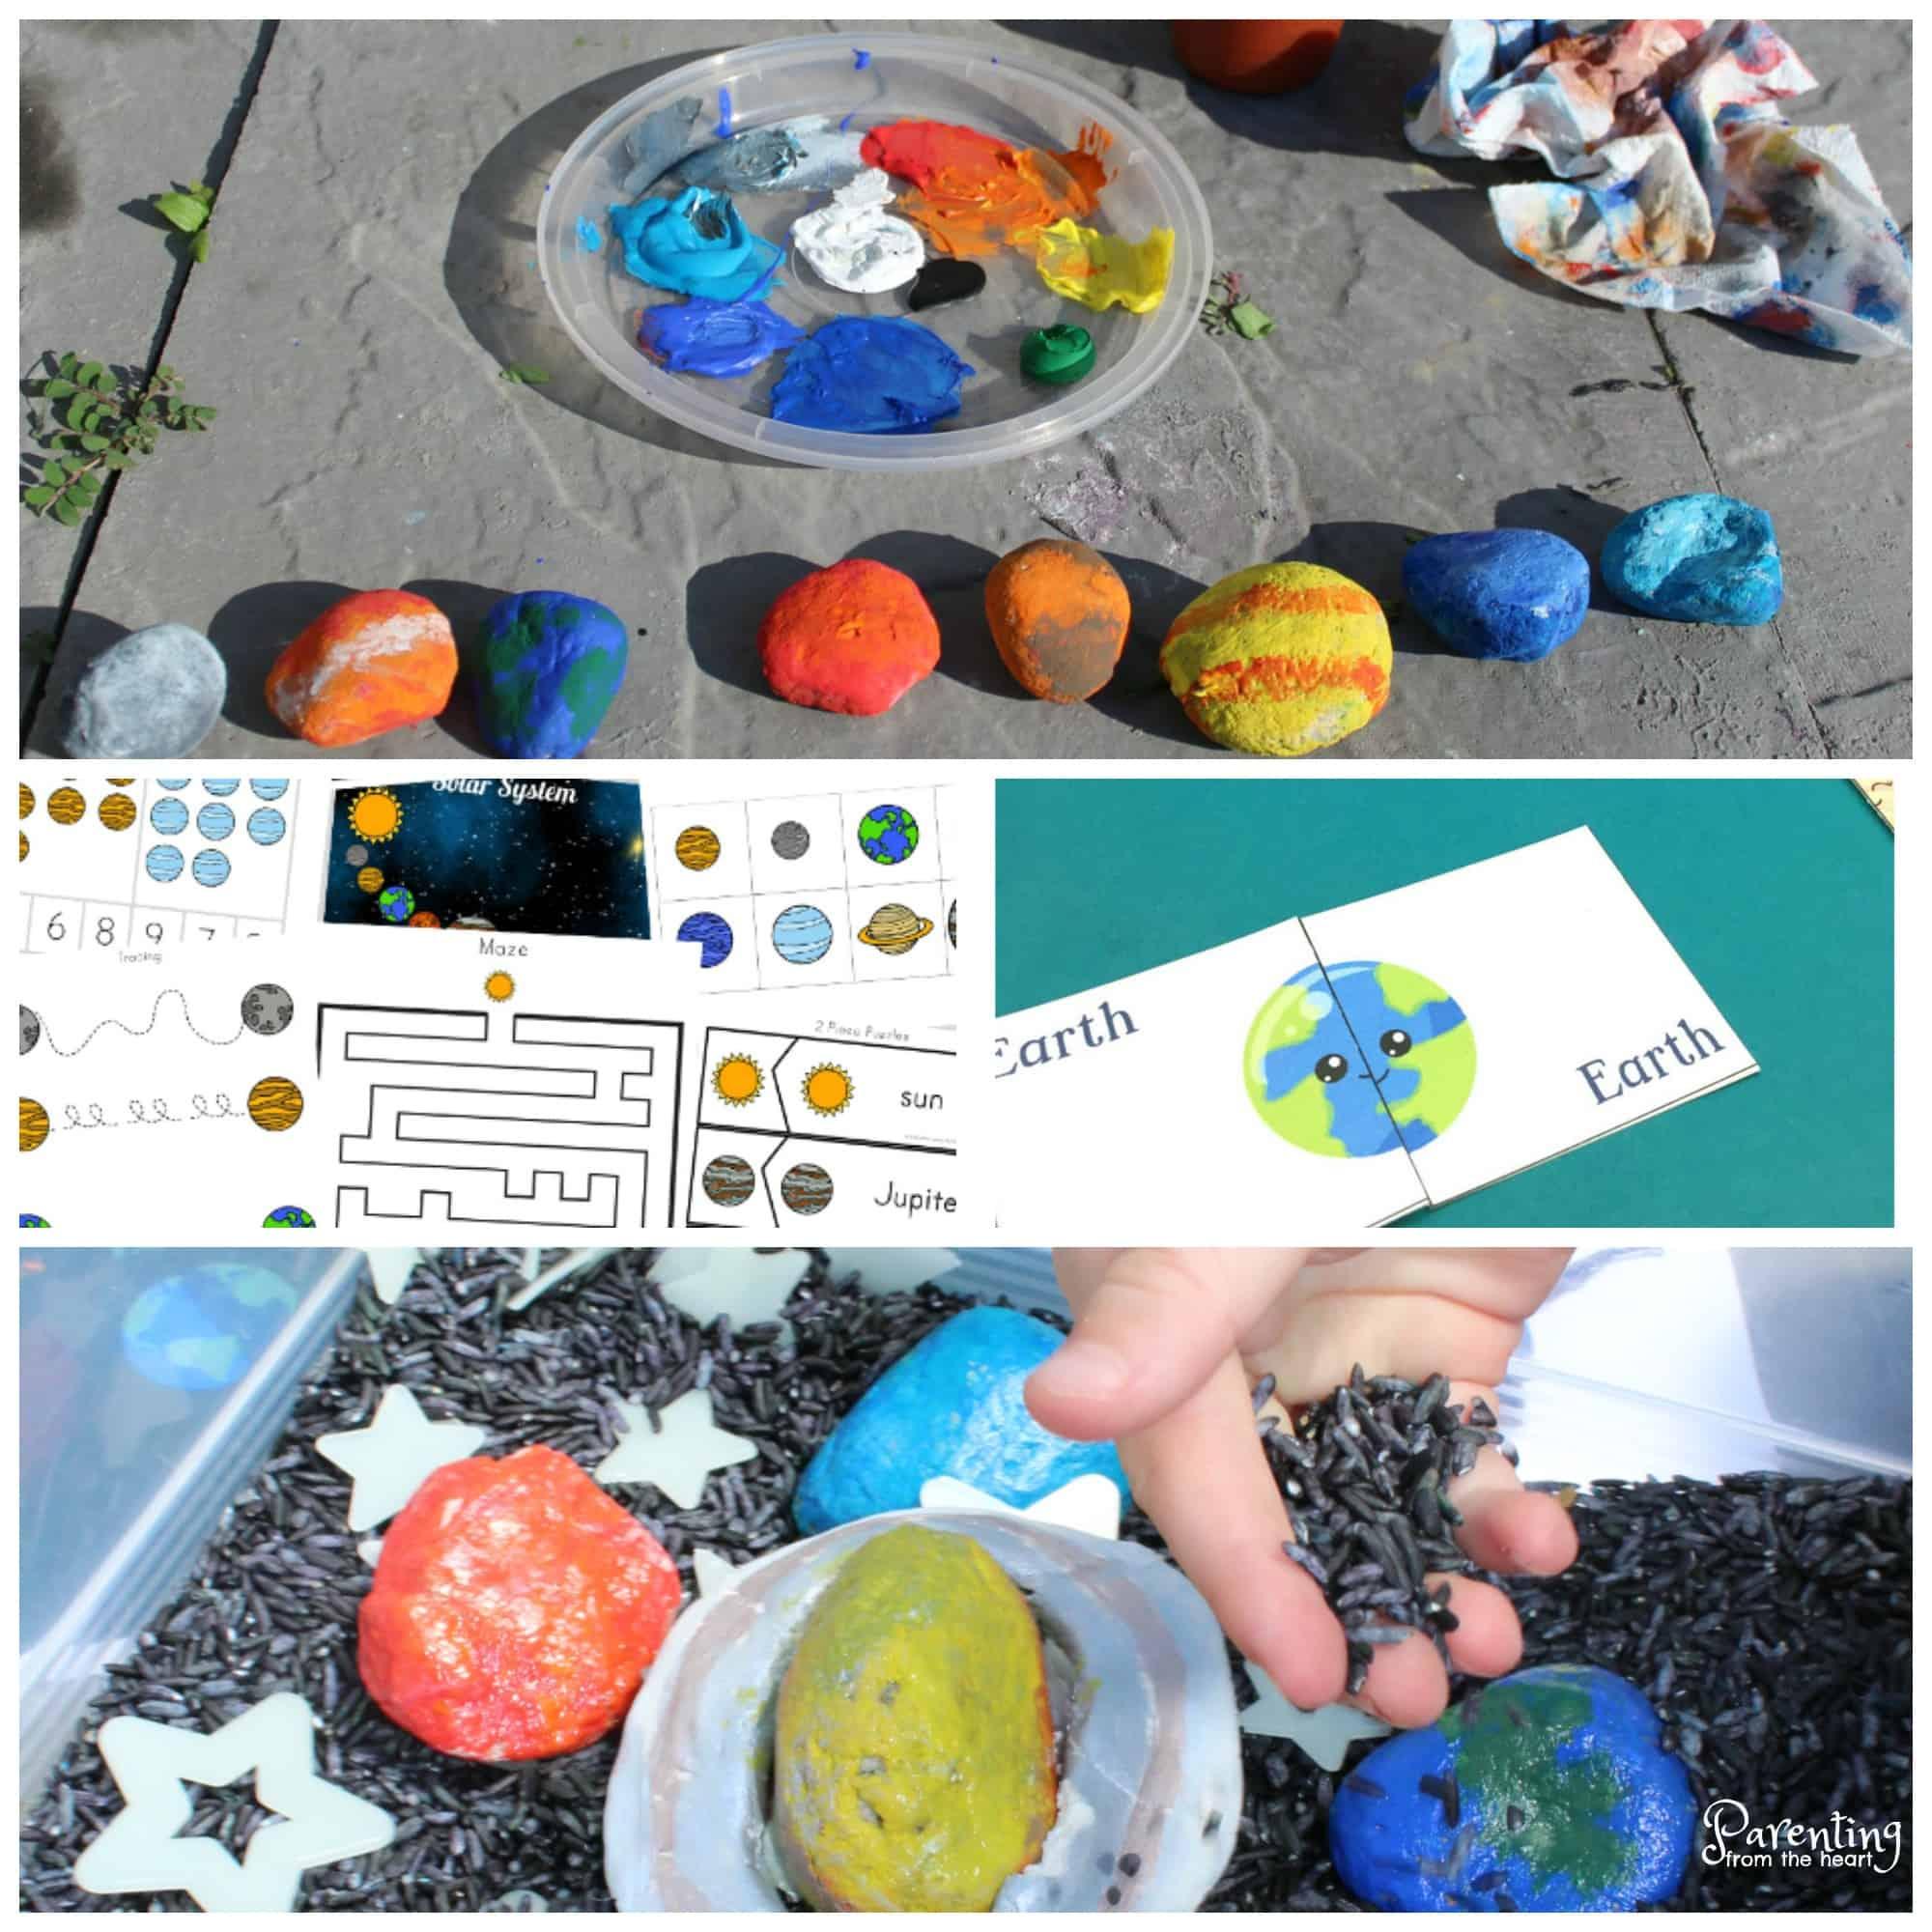 Solar System Worksheets: Free Printables For Preschoolers And Older - Free Printable Solar System Worksheets